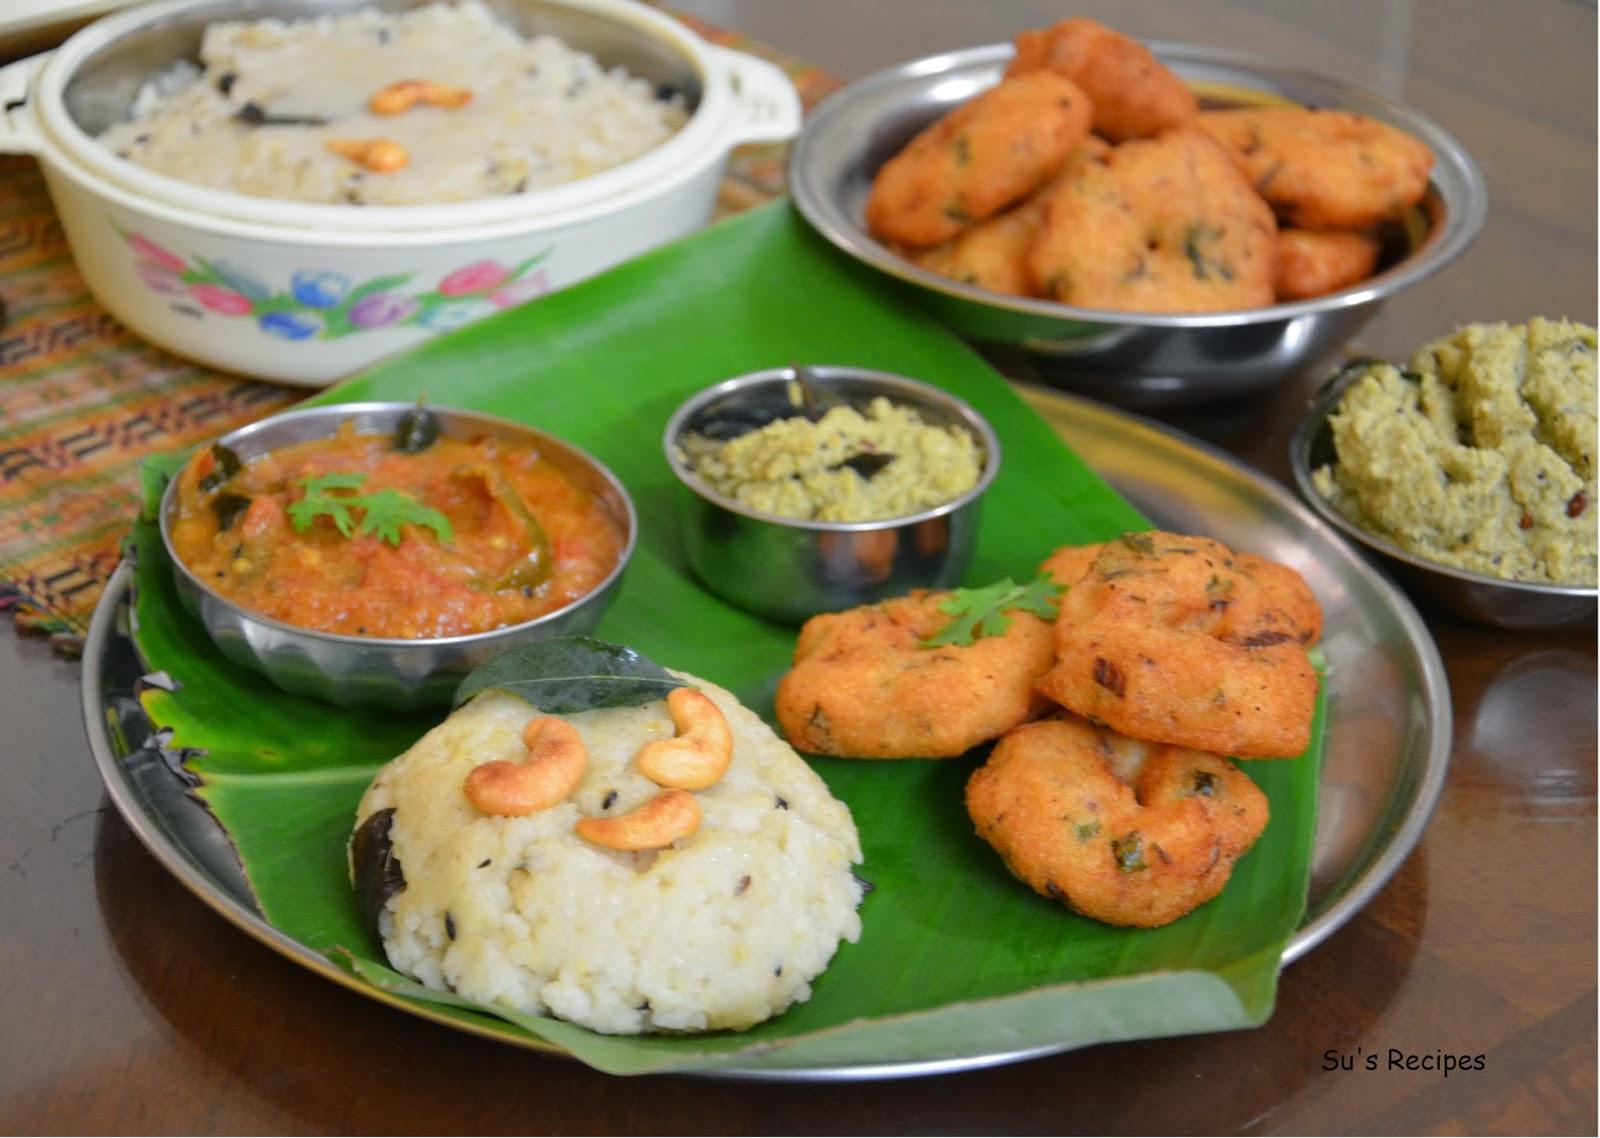 ven pongal, pongal, pongali, kichdi, dal and rice